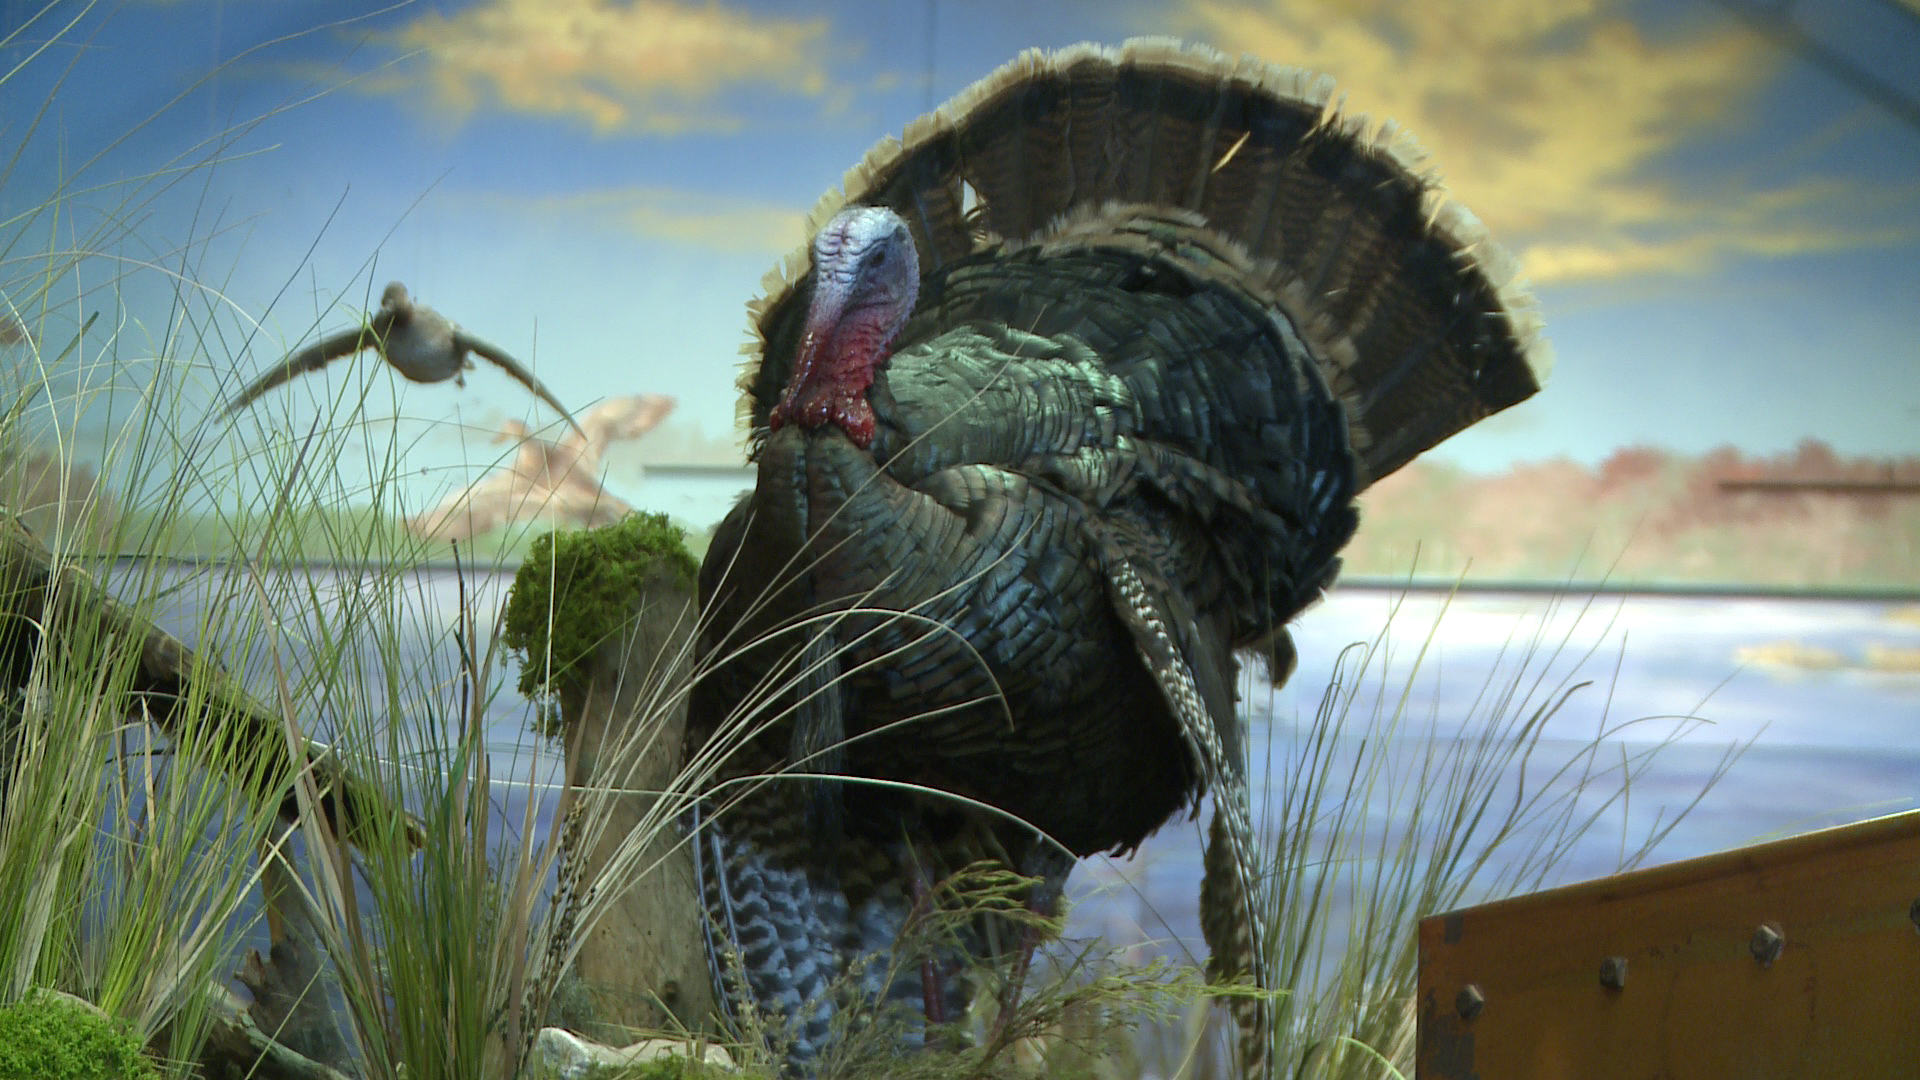 download Mo Wild Turkey Season Starts April 15 KOMUcom 1920x1080